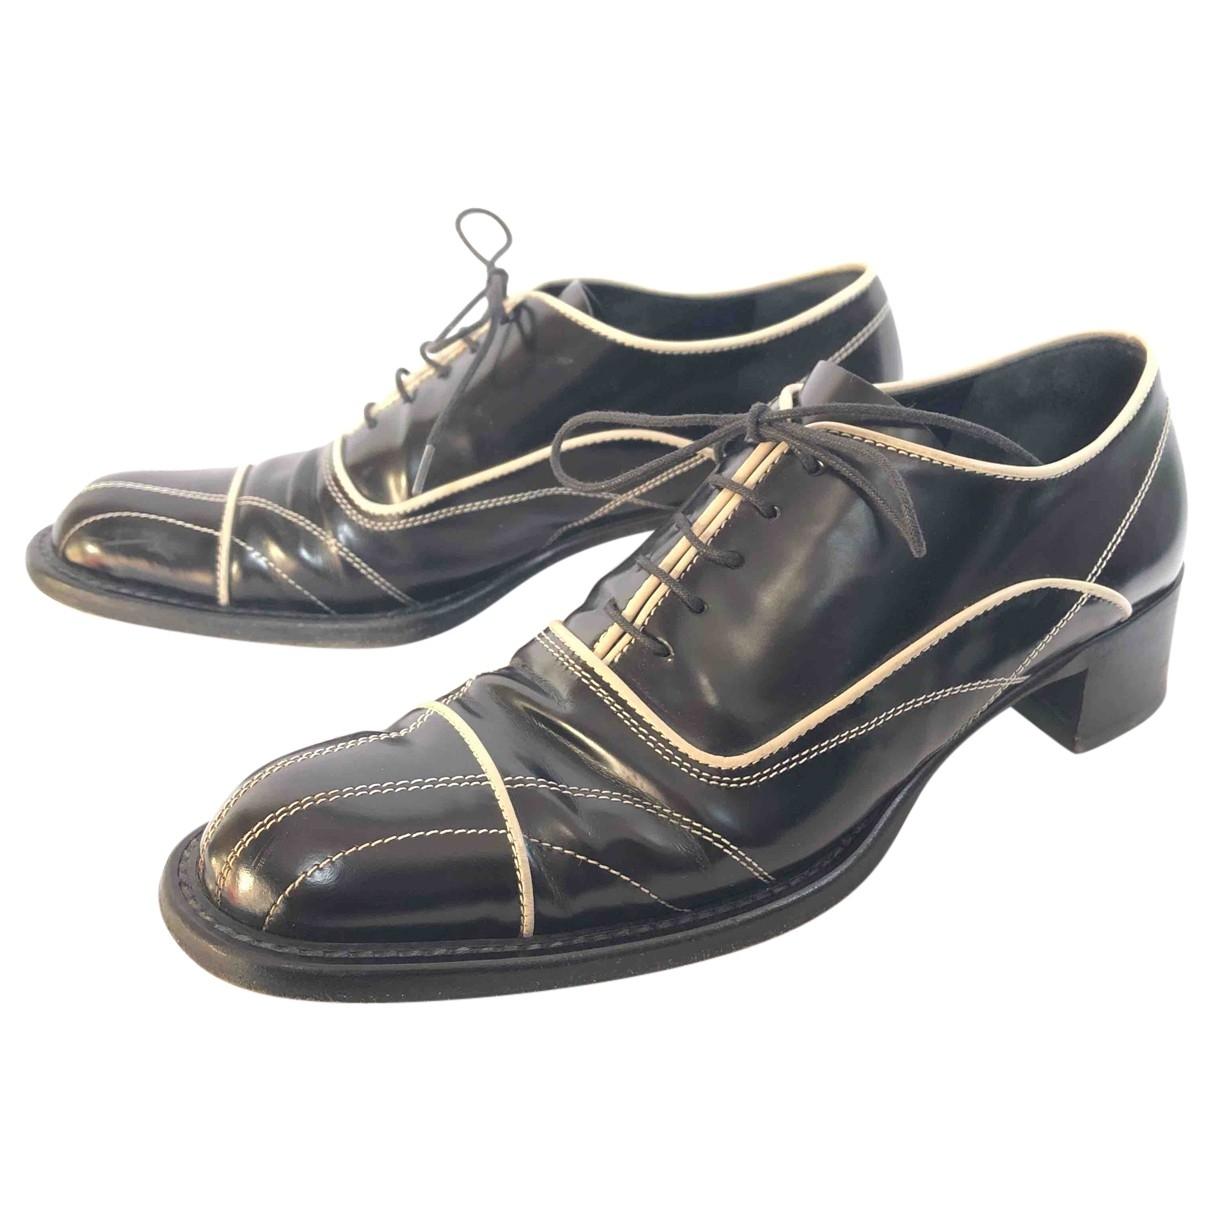 Prada \N Black Leather Lace ups for Women 36 EU